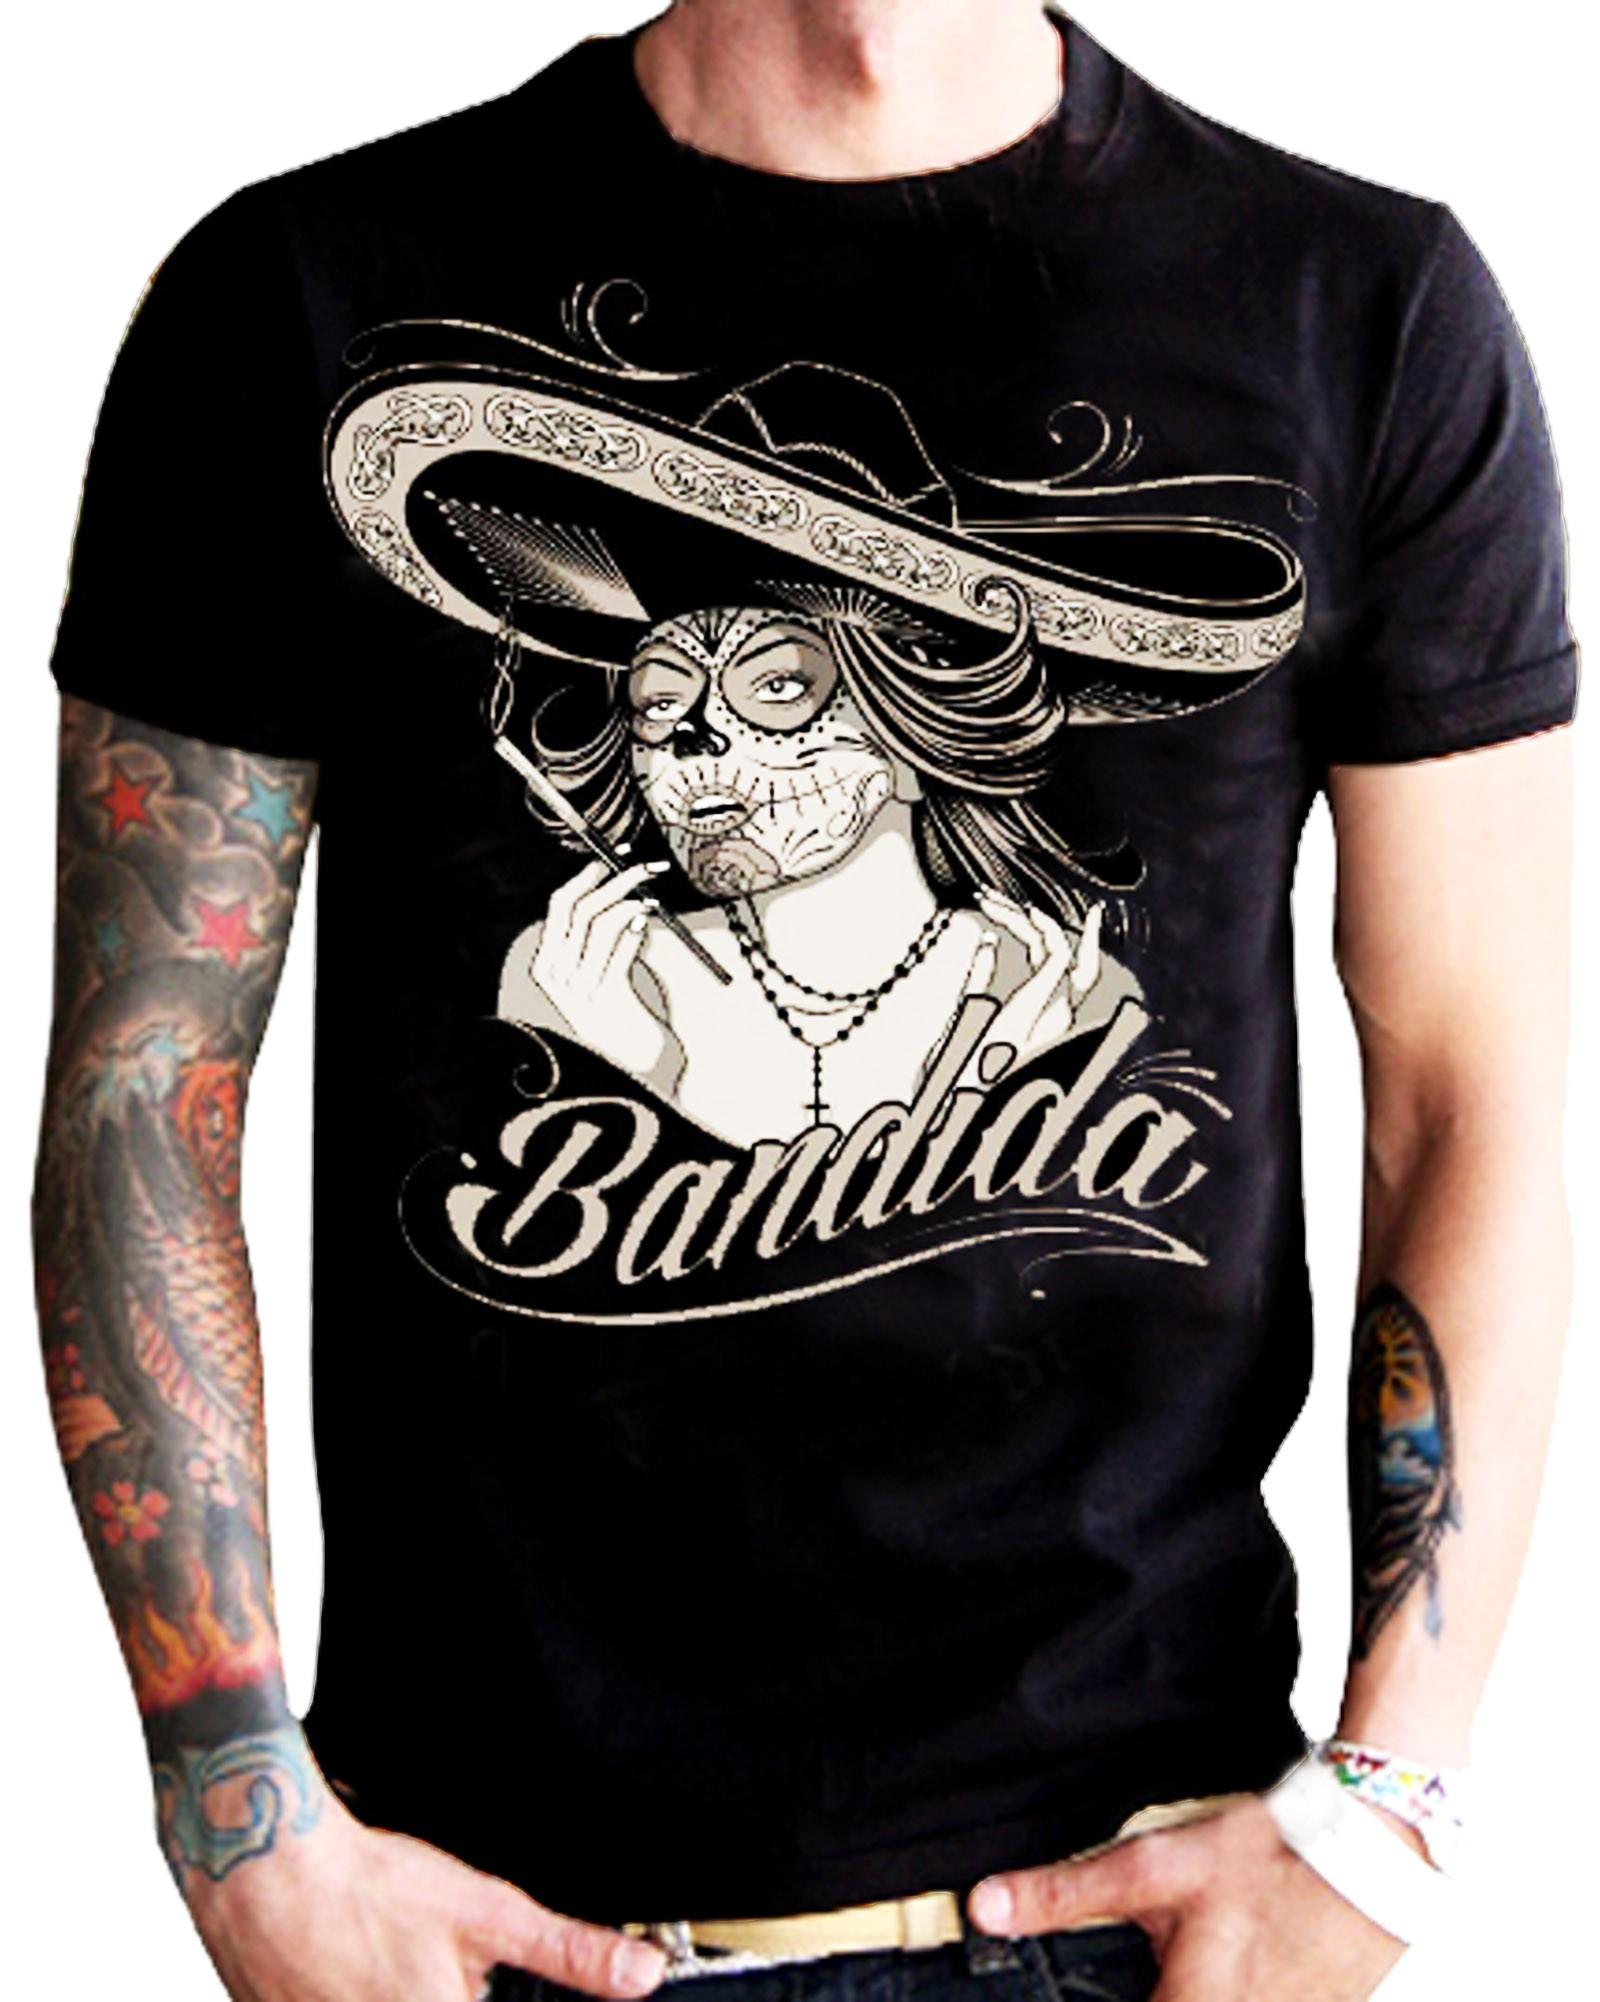 La Marca Del Diablo - La Bandida T-Shirt Front